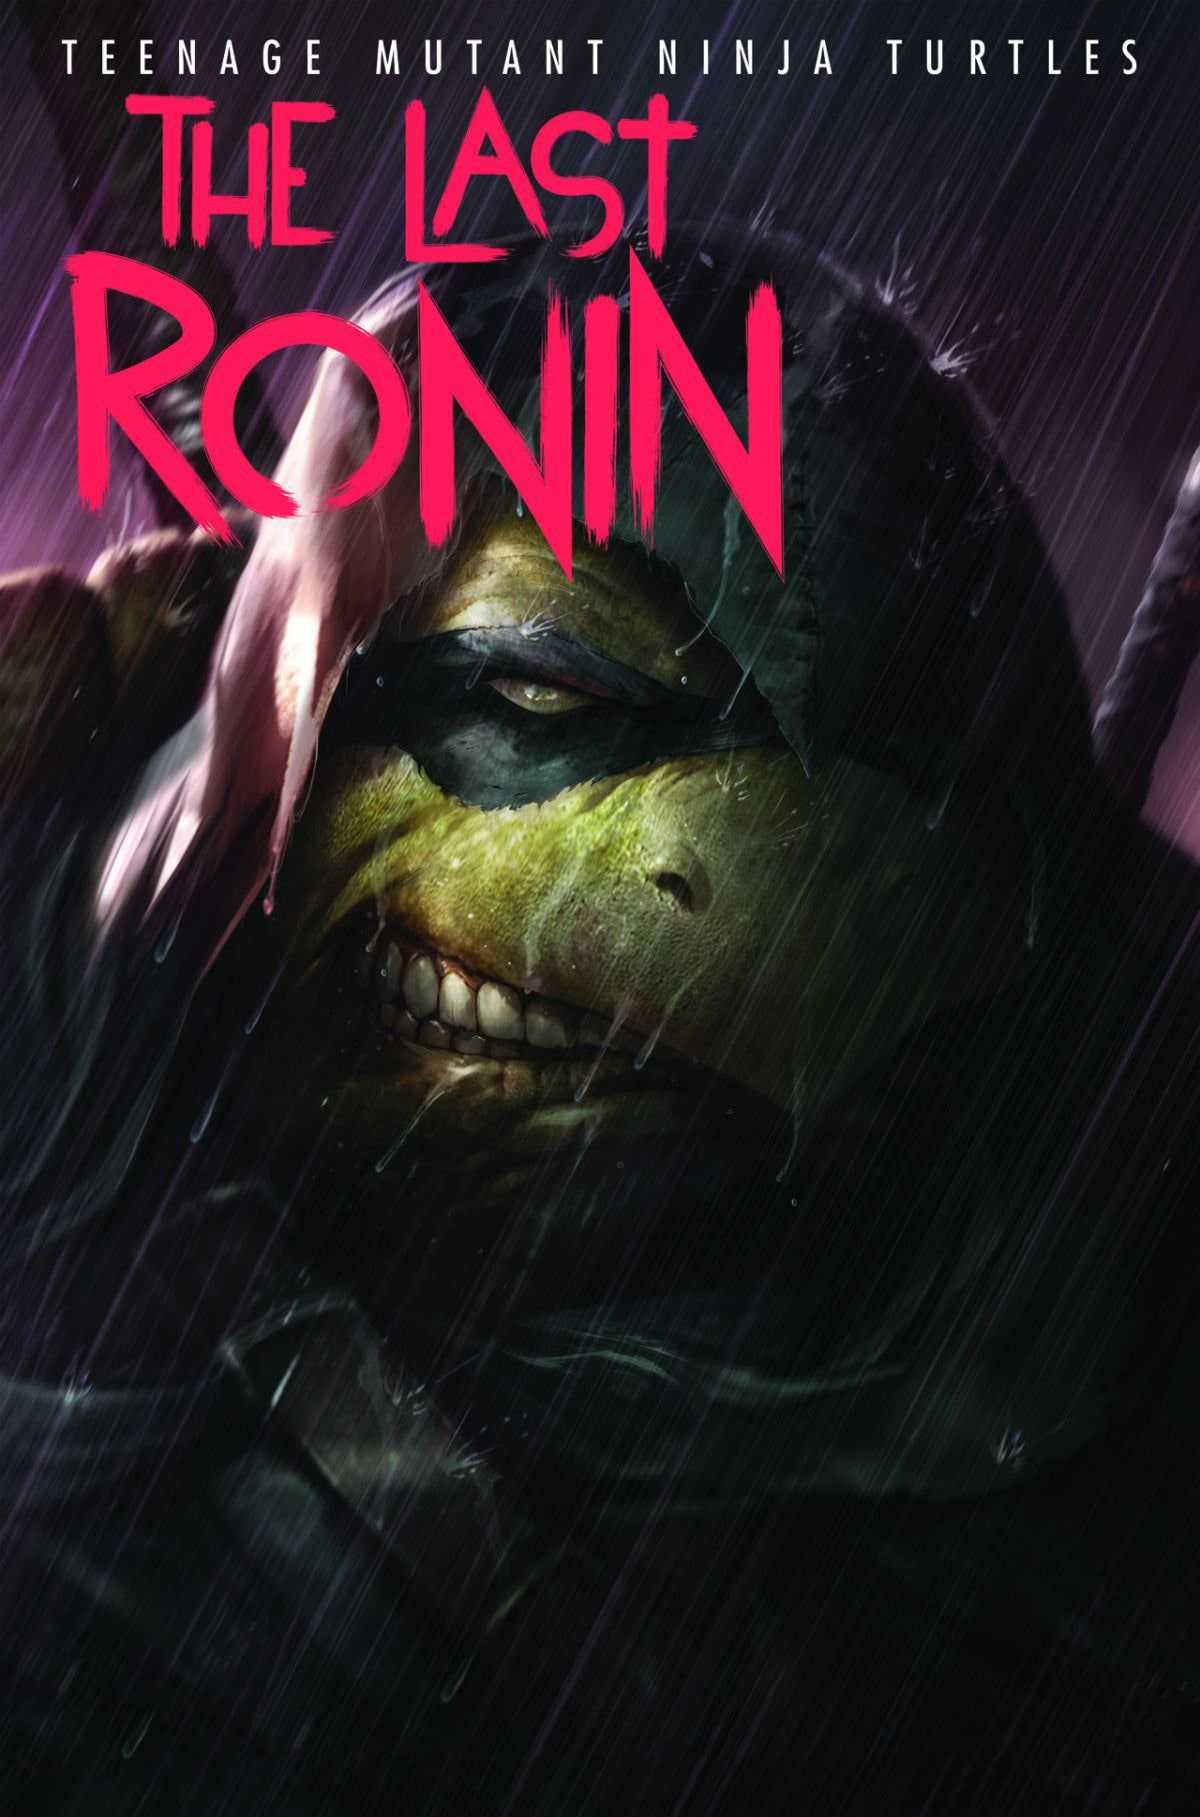 The Last Ronin Wallpaper - KoLPaPer ...